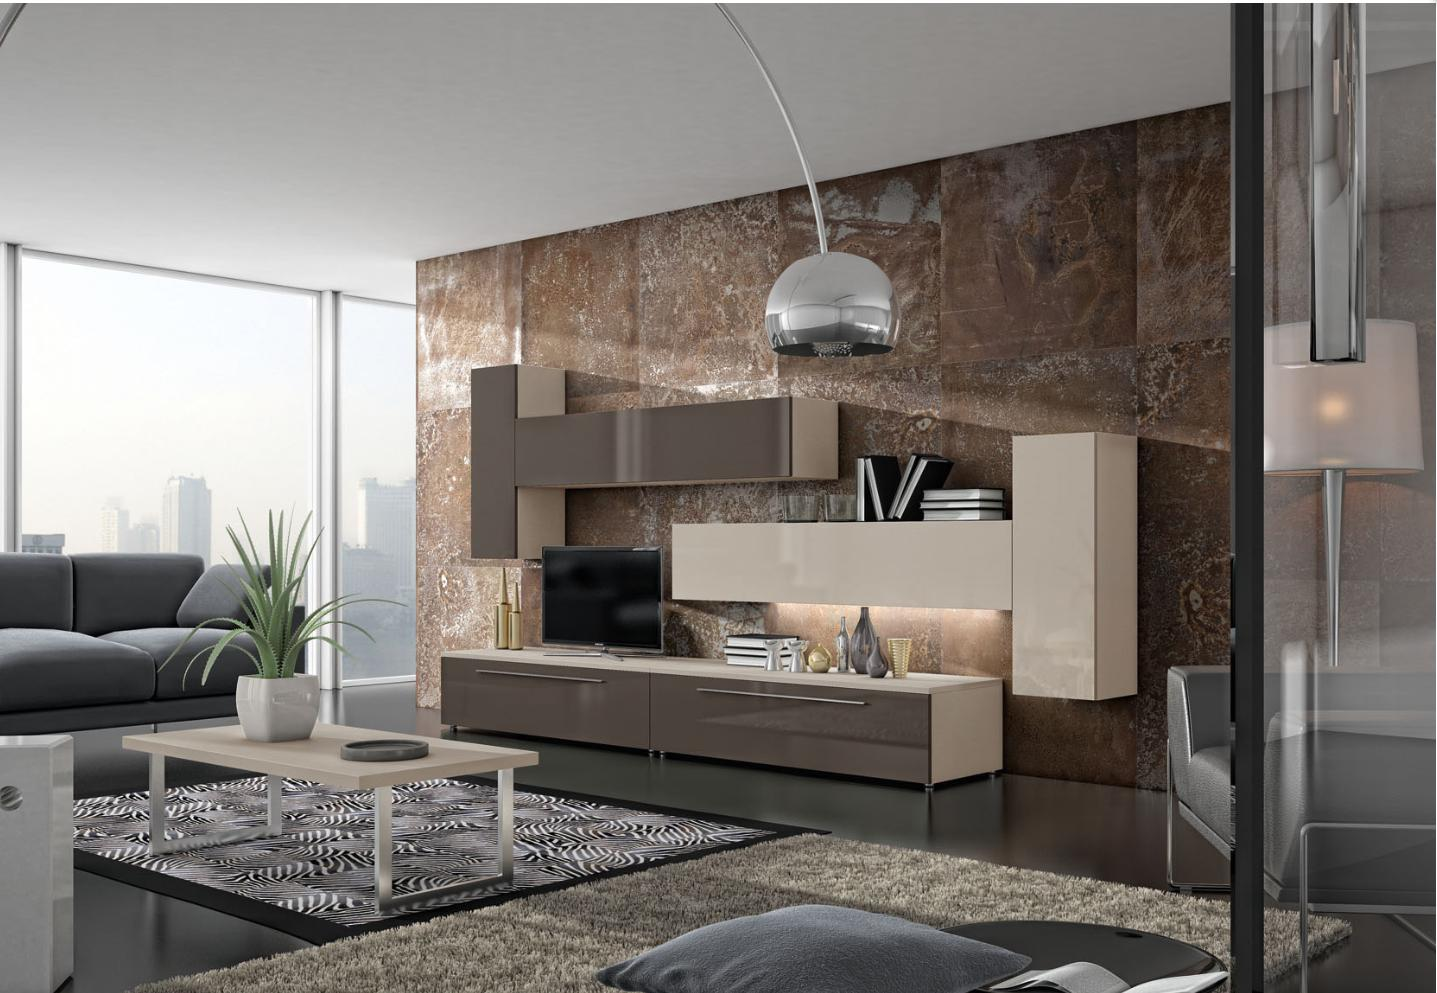 Salon apilable linea moderna cat logo de muebles for Catalogo de salones